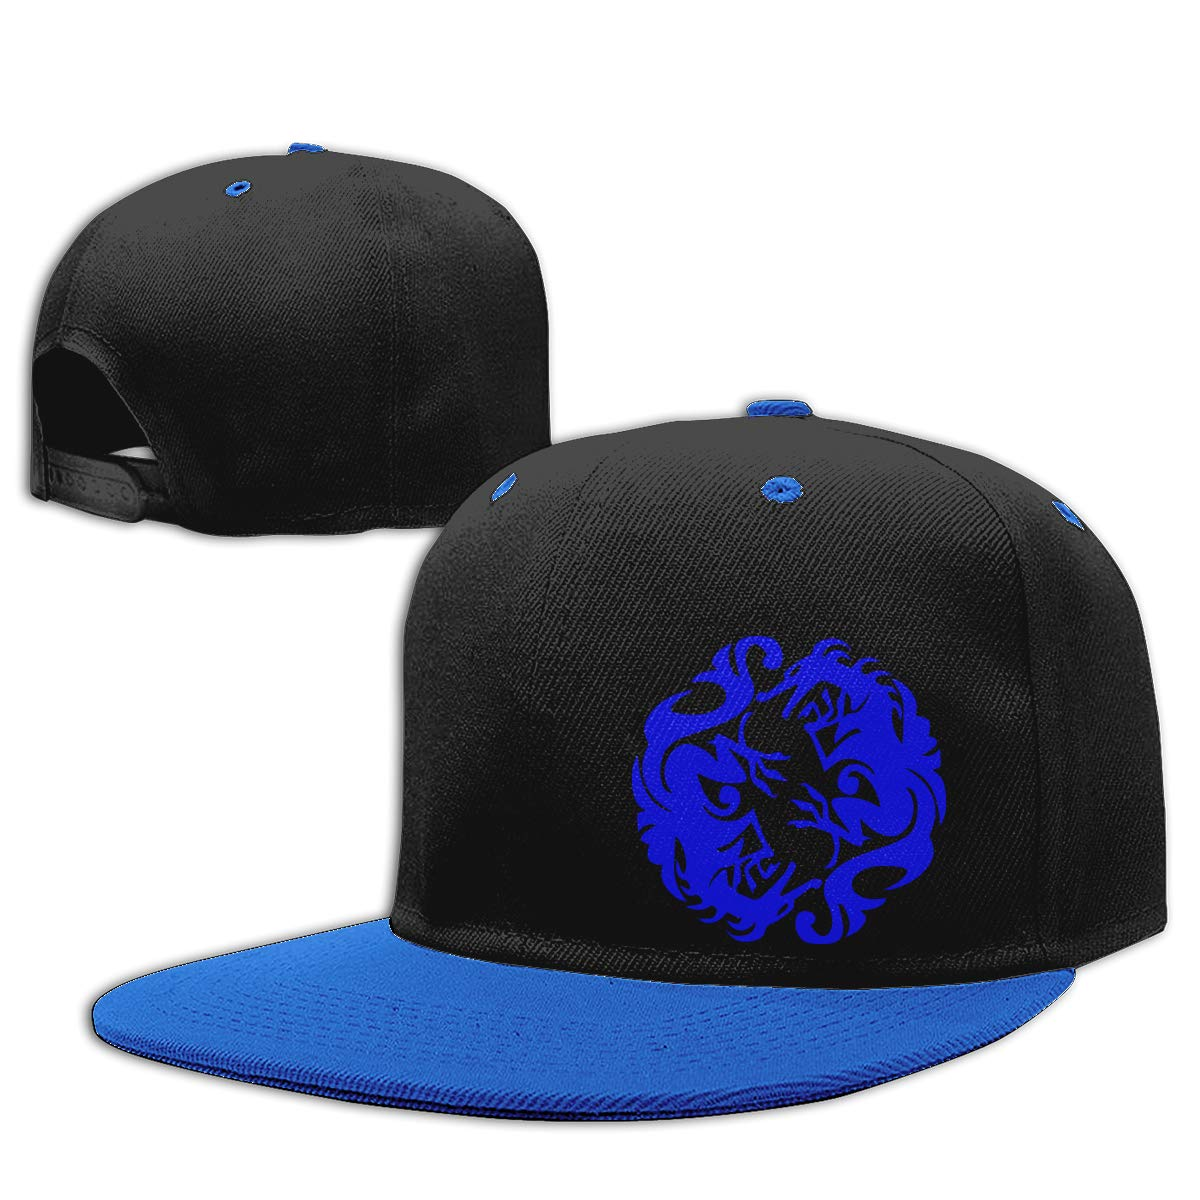 Men and Women Snapback Cap Double Dragon Printed Hip Hop Baseball Caps